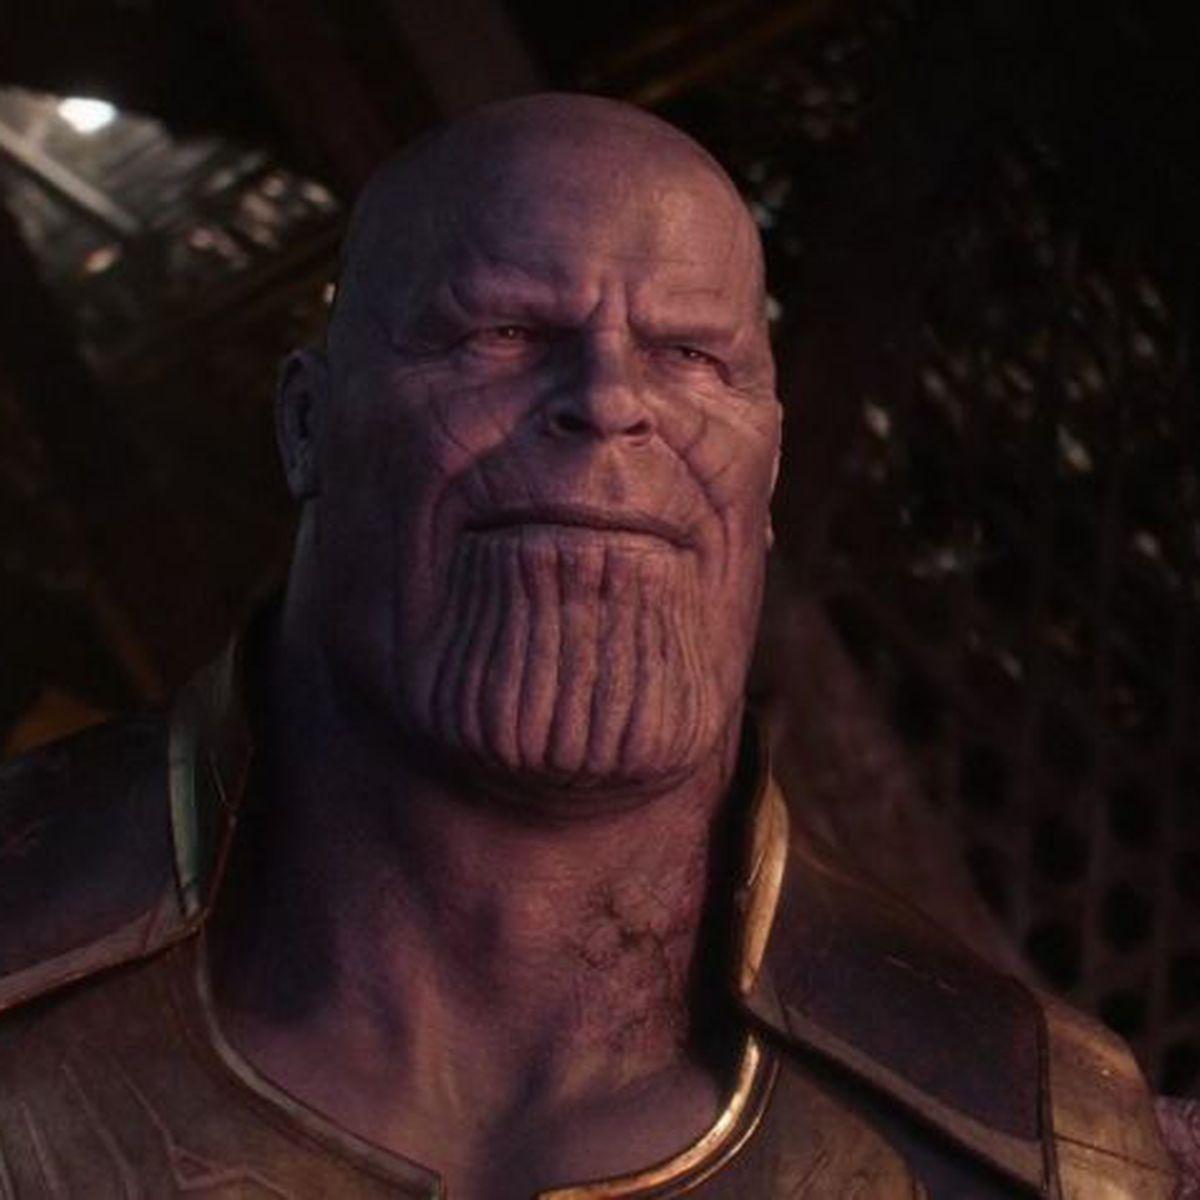 Avengers 4 Endgame Thanos No Sera El Villano Segun Nueva